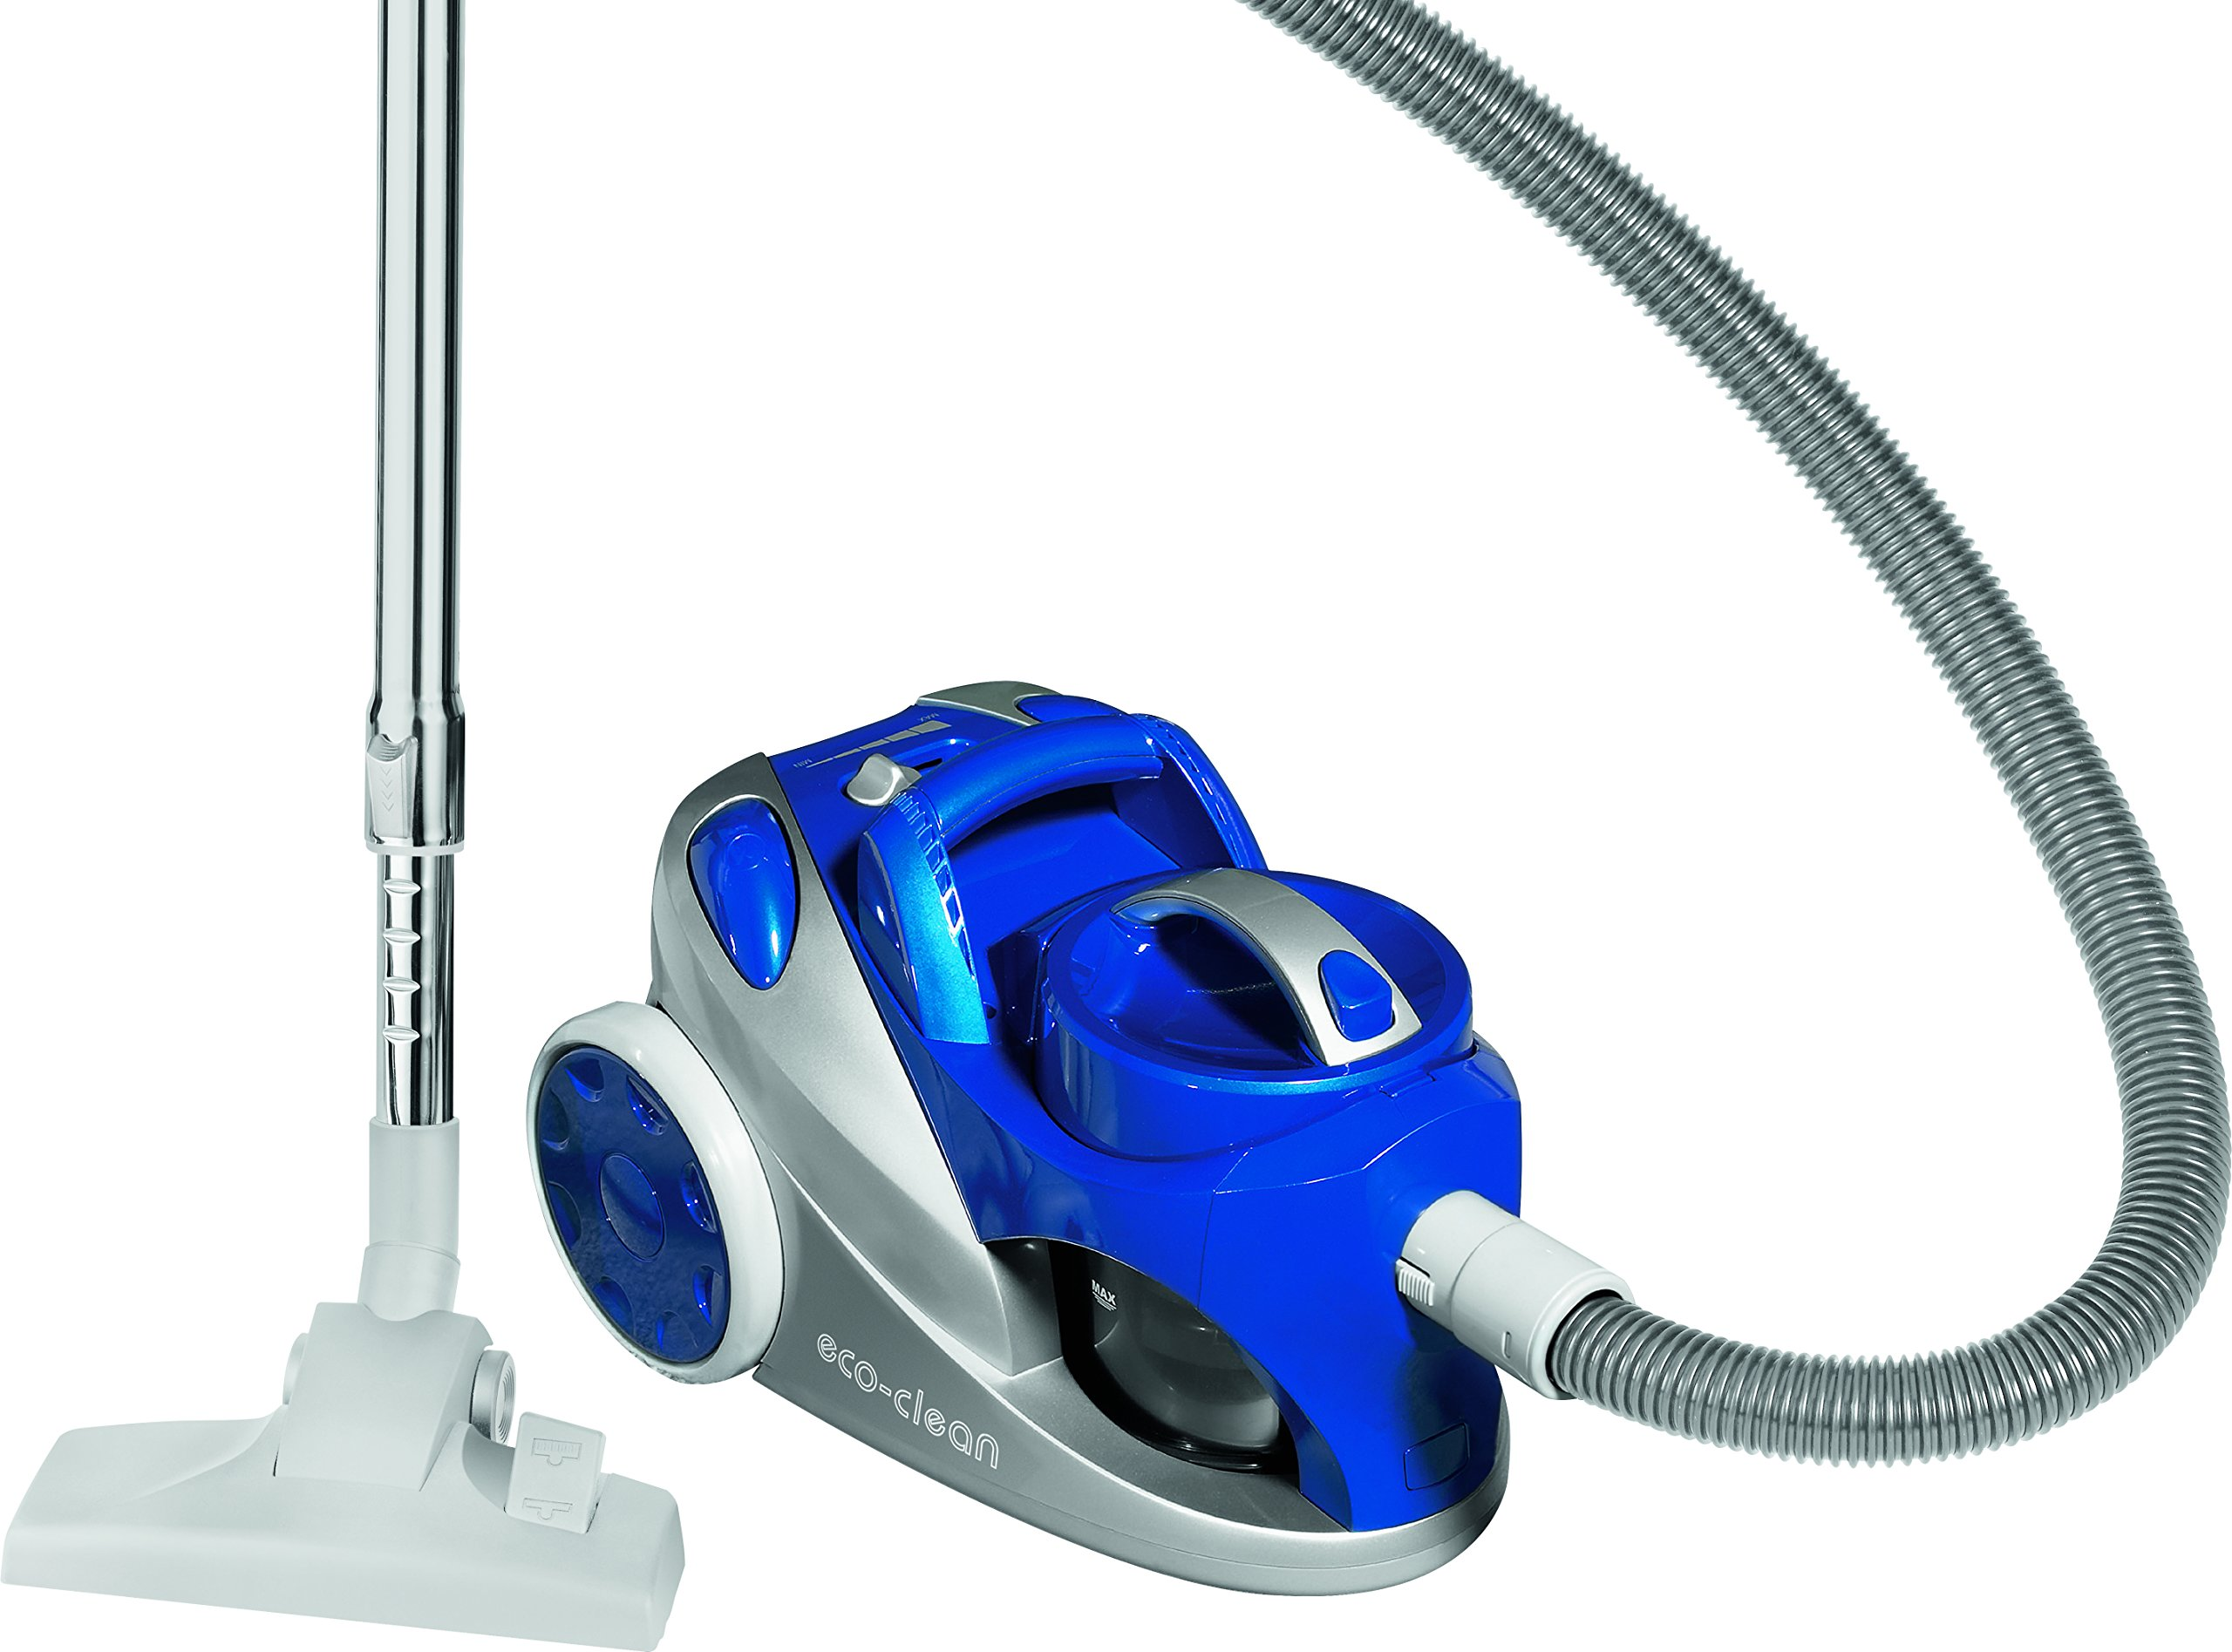 Bomann BS 971.1 CB - Aspiradora sin bolsa (700 W), color azul y ...